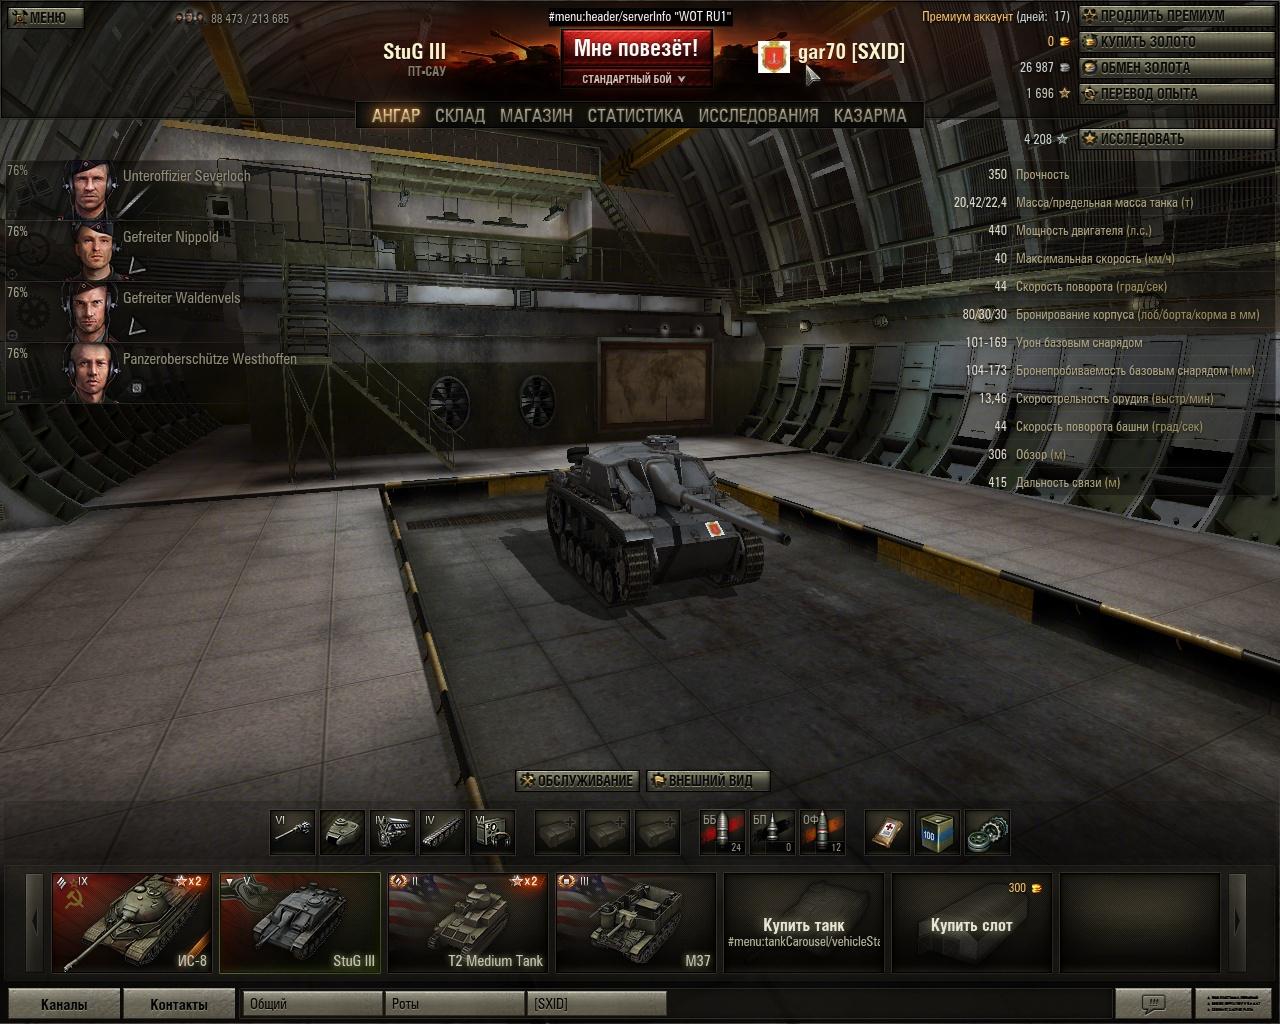 Настройки графики в World of Tanks. Играть онлайн в «Танки» со 36